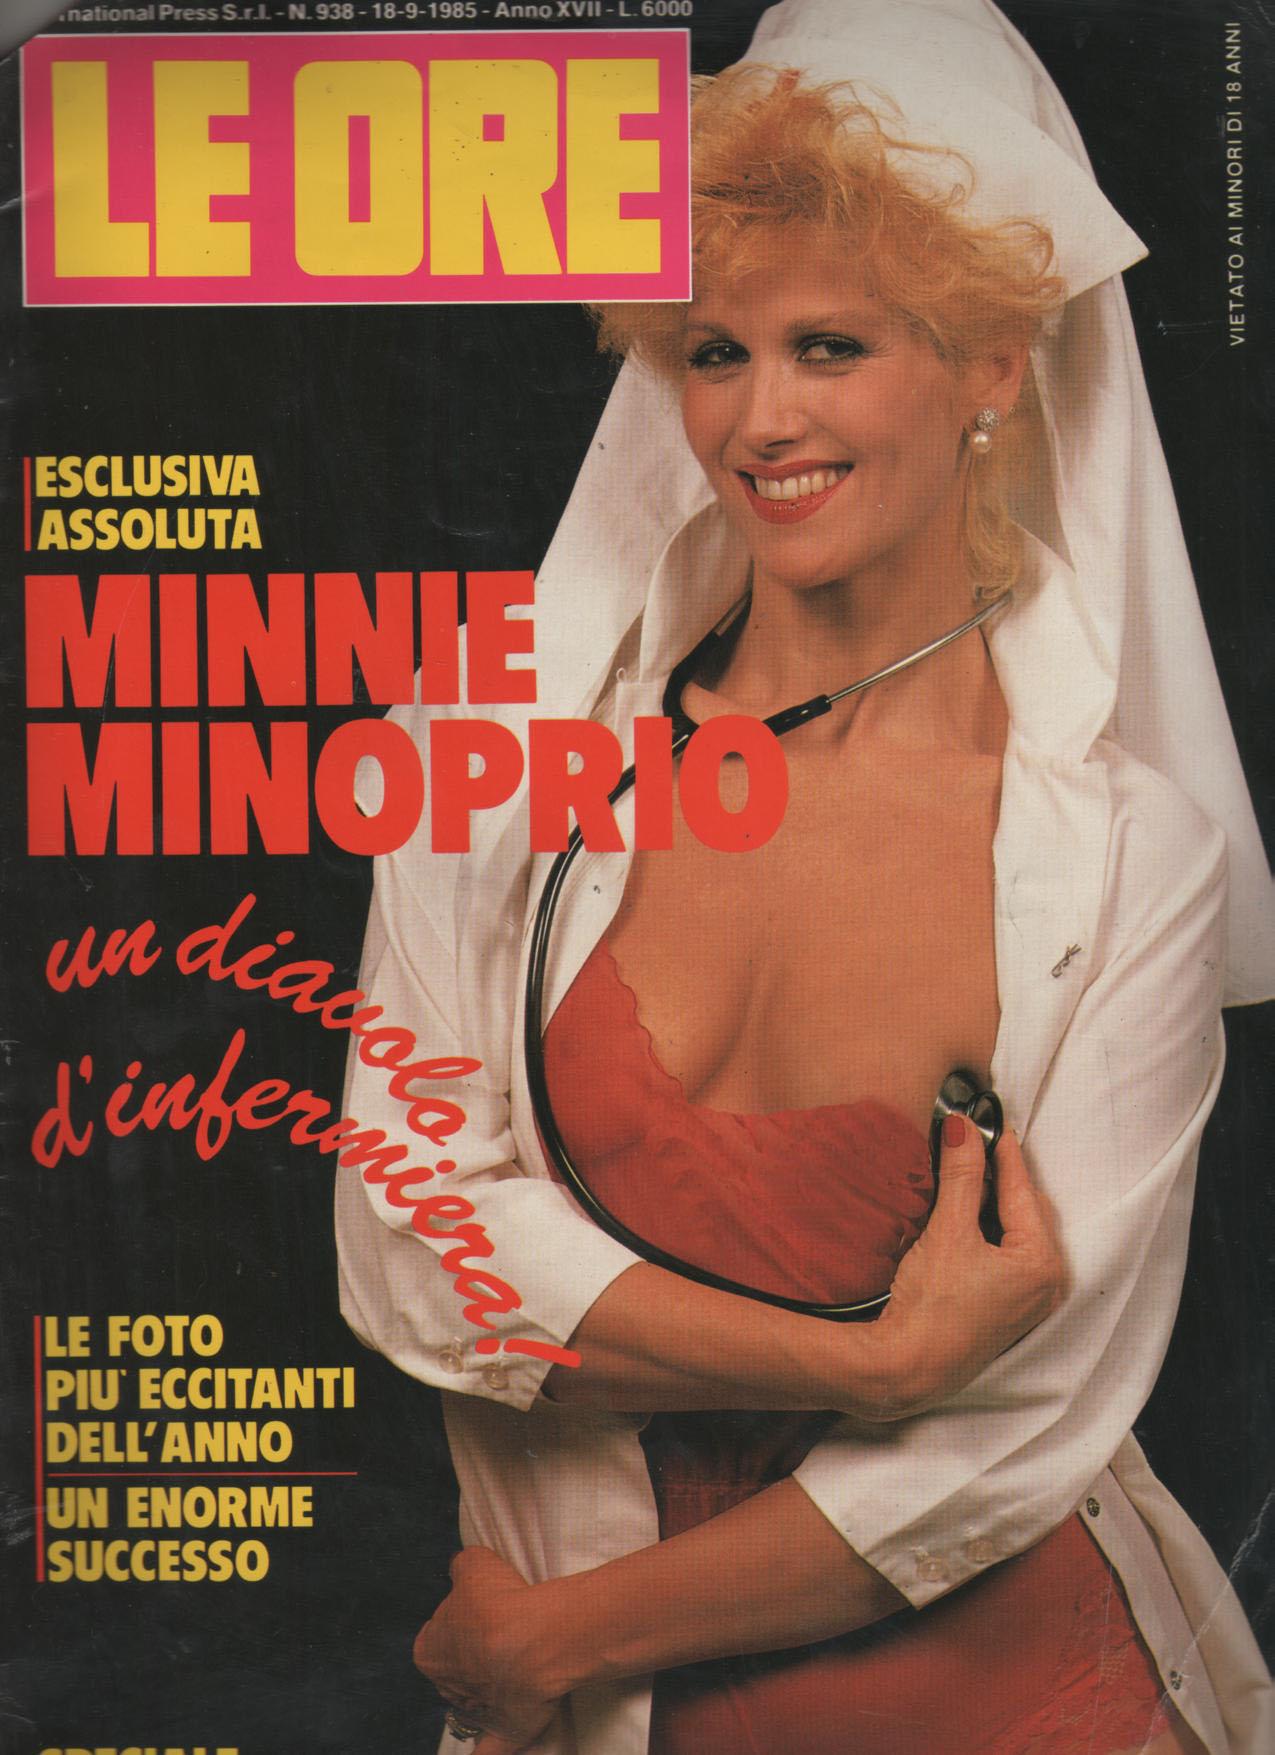 http://curiosando708090.altervista.org/wp-content/uploads/2011/09/Minnie-Minoprio-Le-ORe-1.jpg